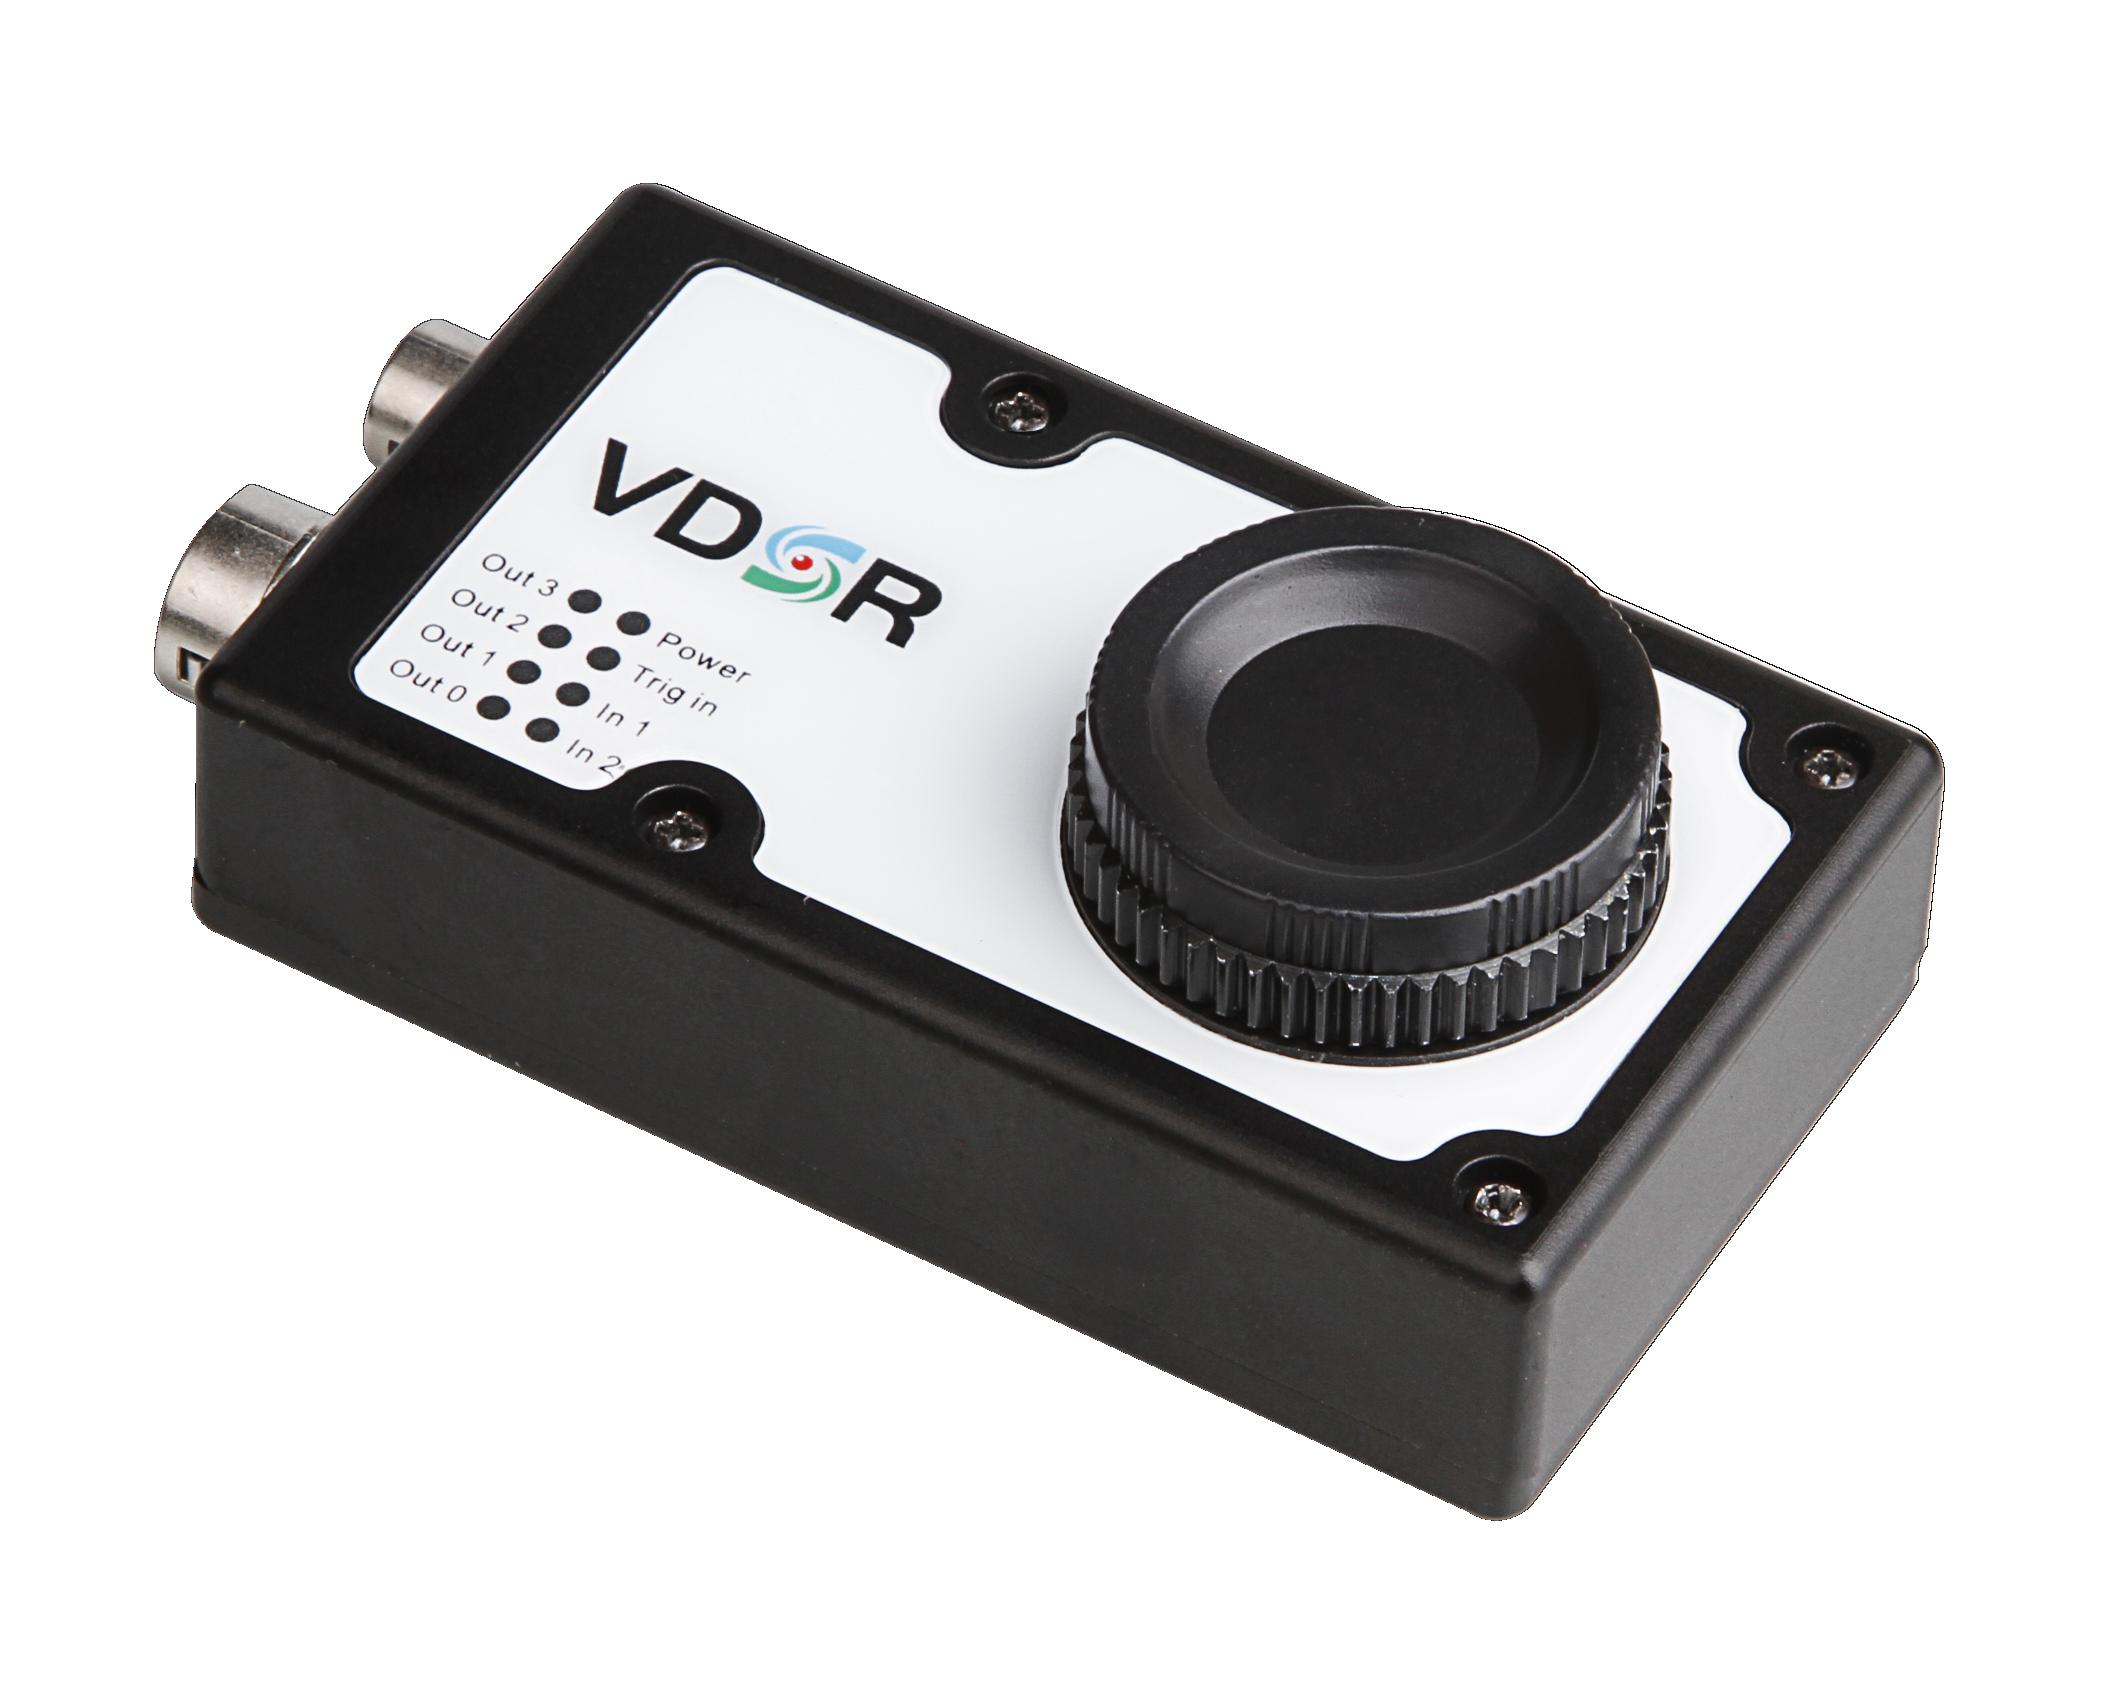 VDSR视觉传感器